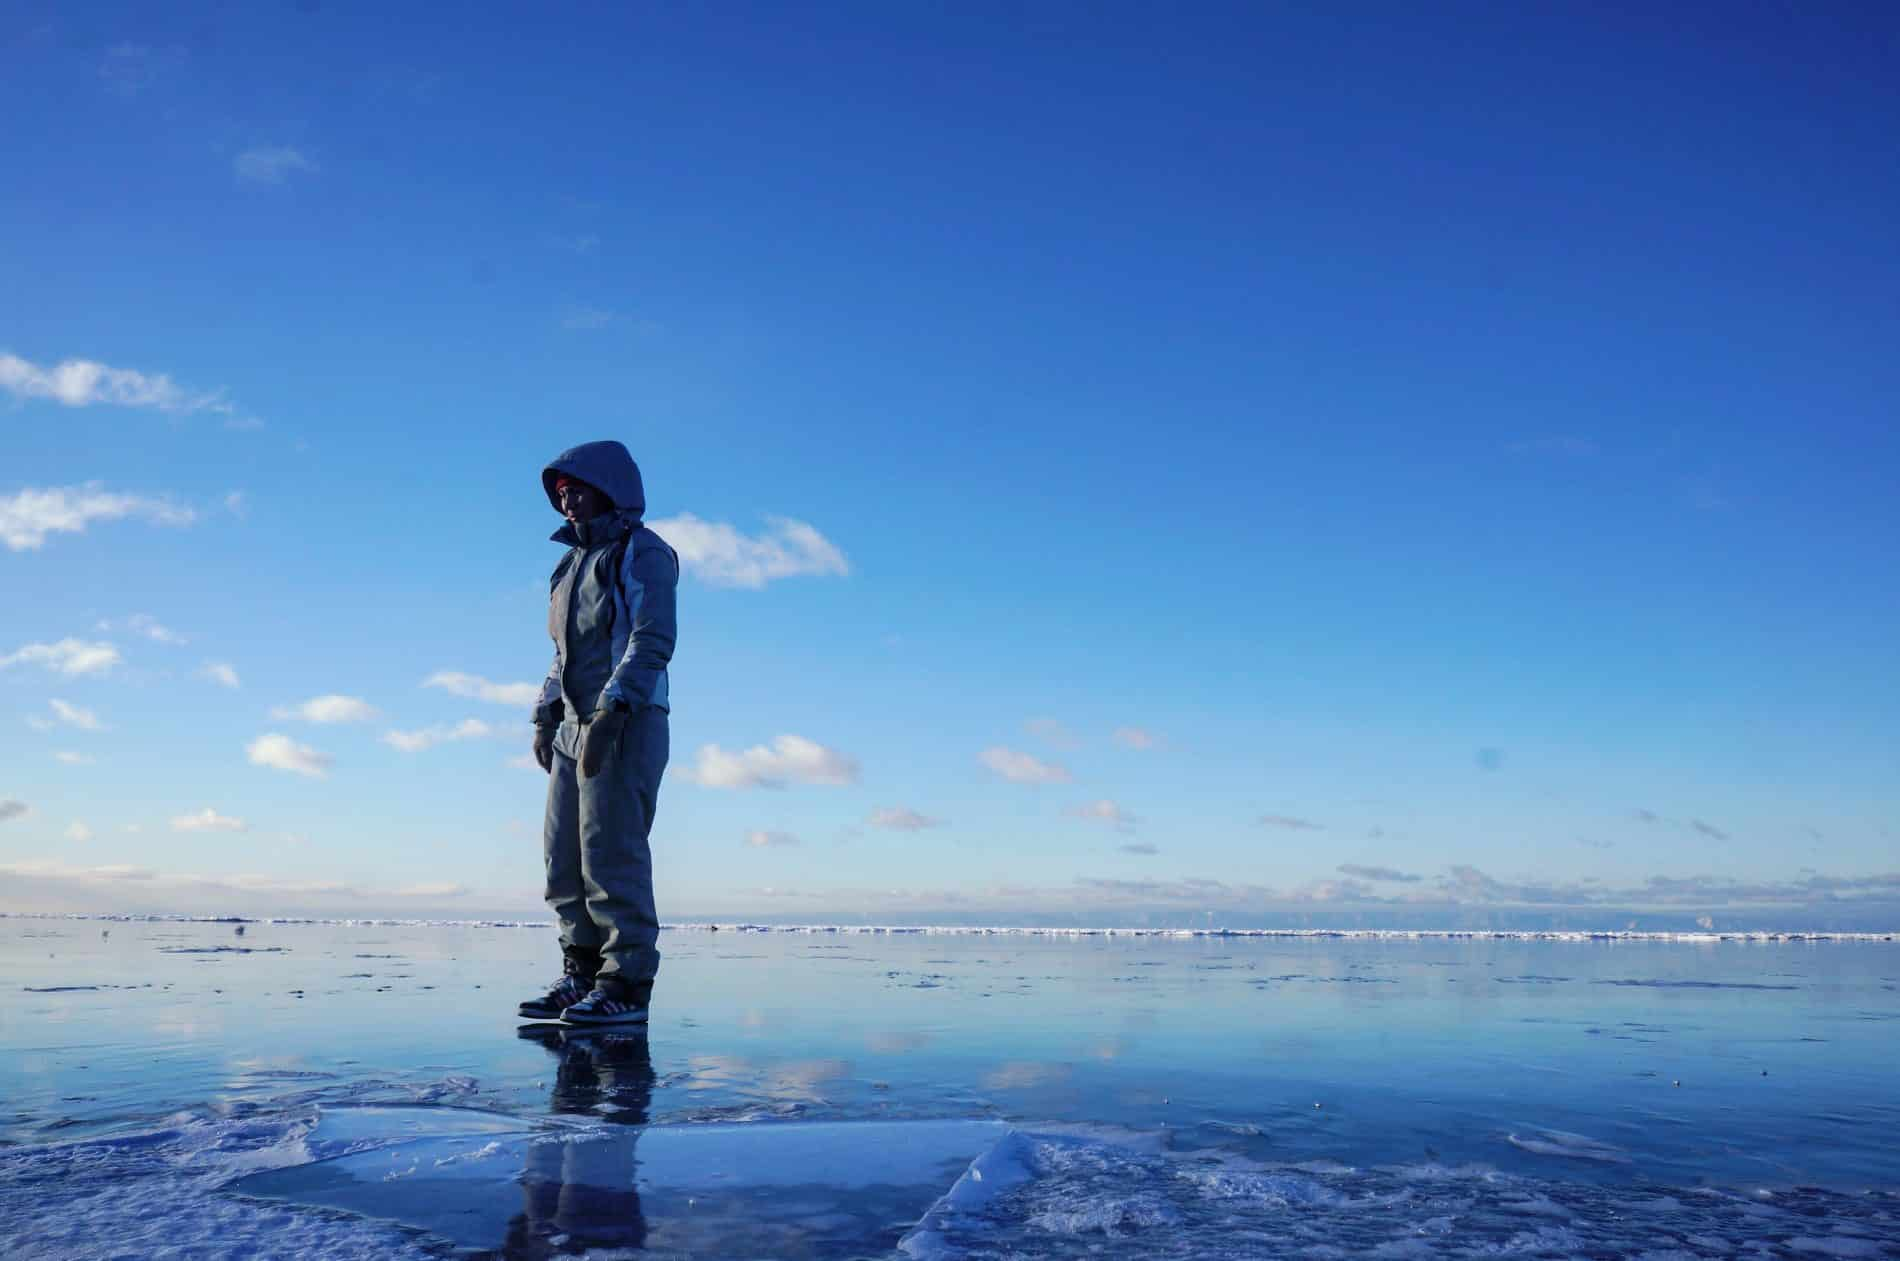 Baikal winter ice